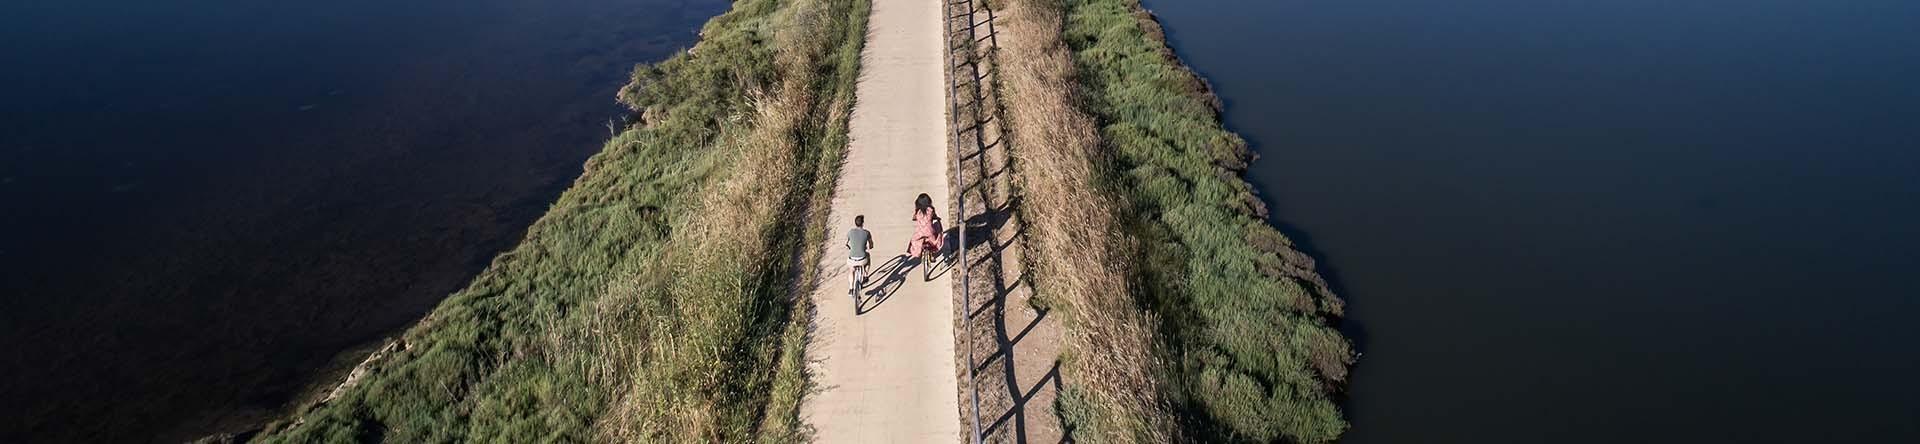 Balade en vélo dans l'archipel de Thau